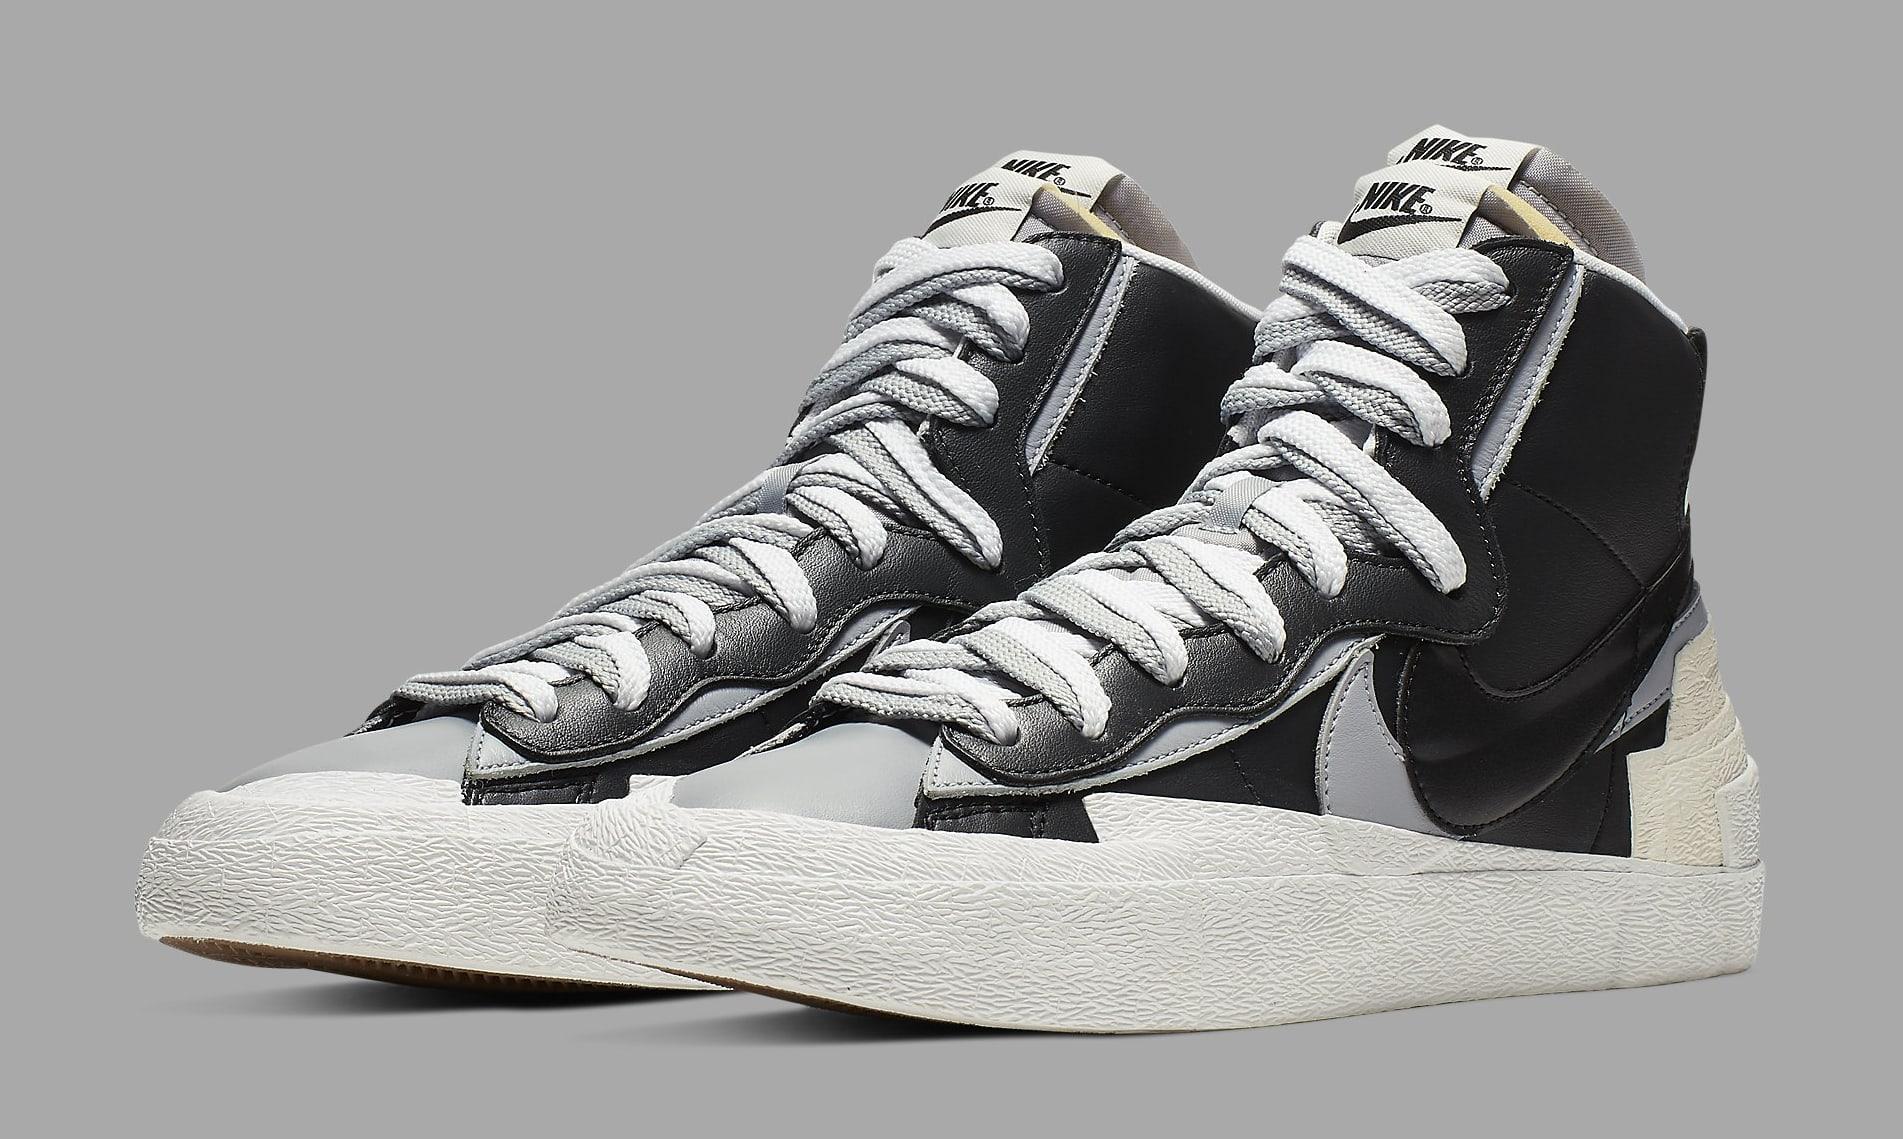 sacai-nike-blazer-mid-black-bv0072-002-pair